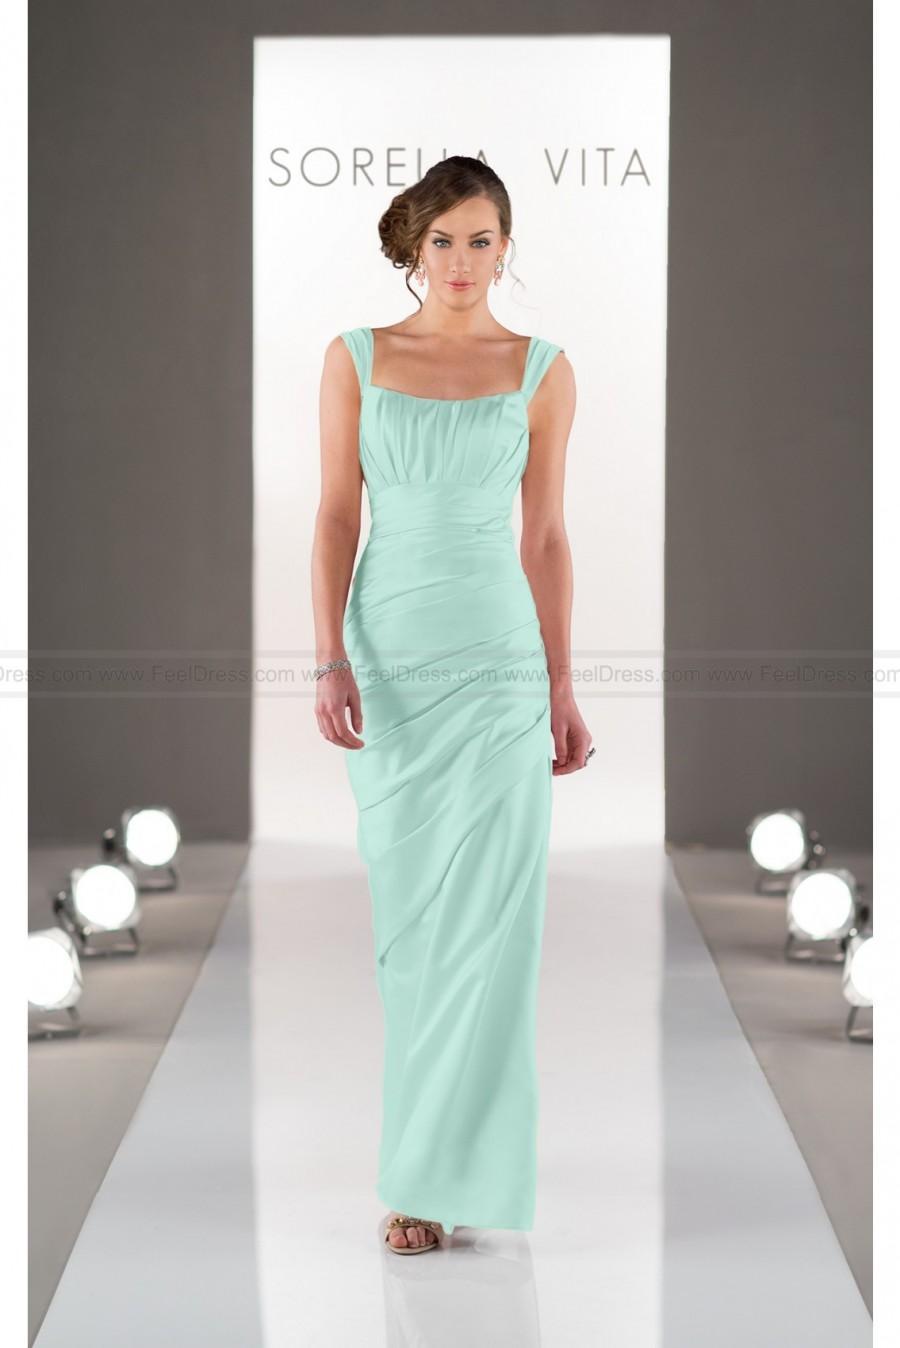 Hochzeit - Sorella Vita Bridesmaid Dress with Straps In Satin Style 8503